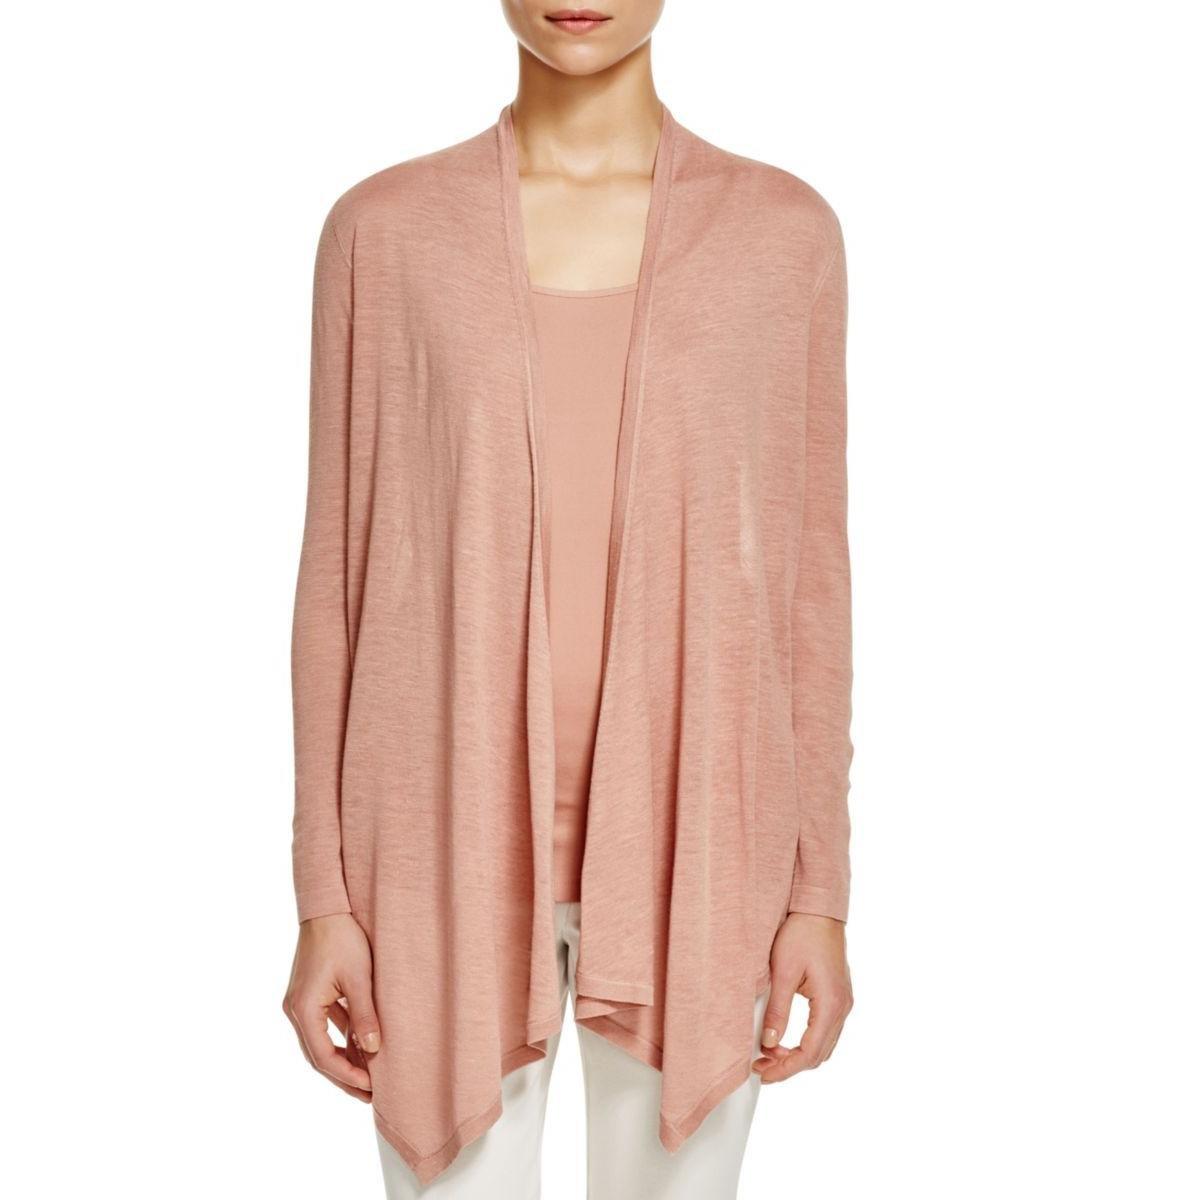 Eileen Fisher Womens Silk Drape Cardigan Top Pink XL